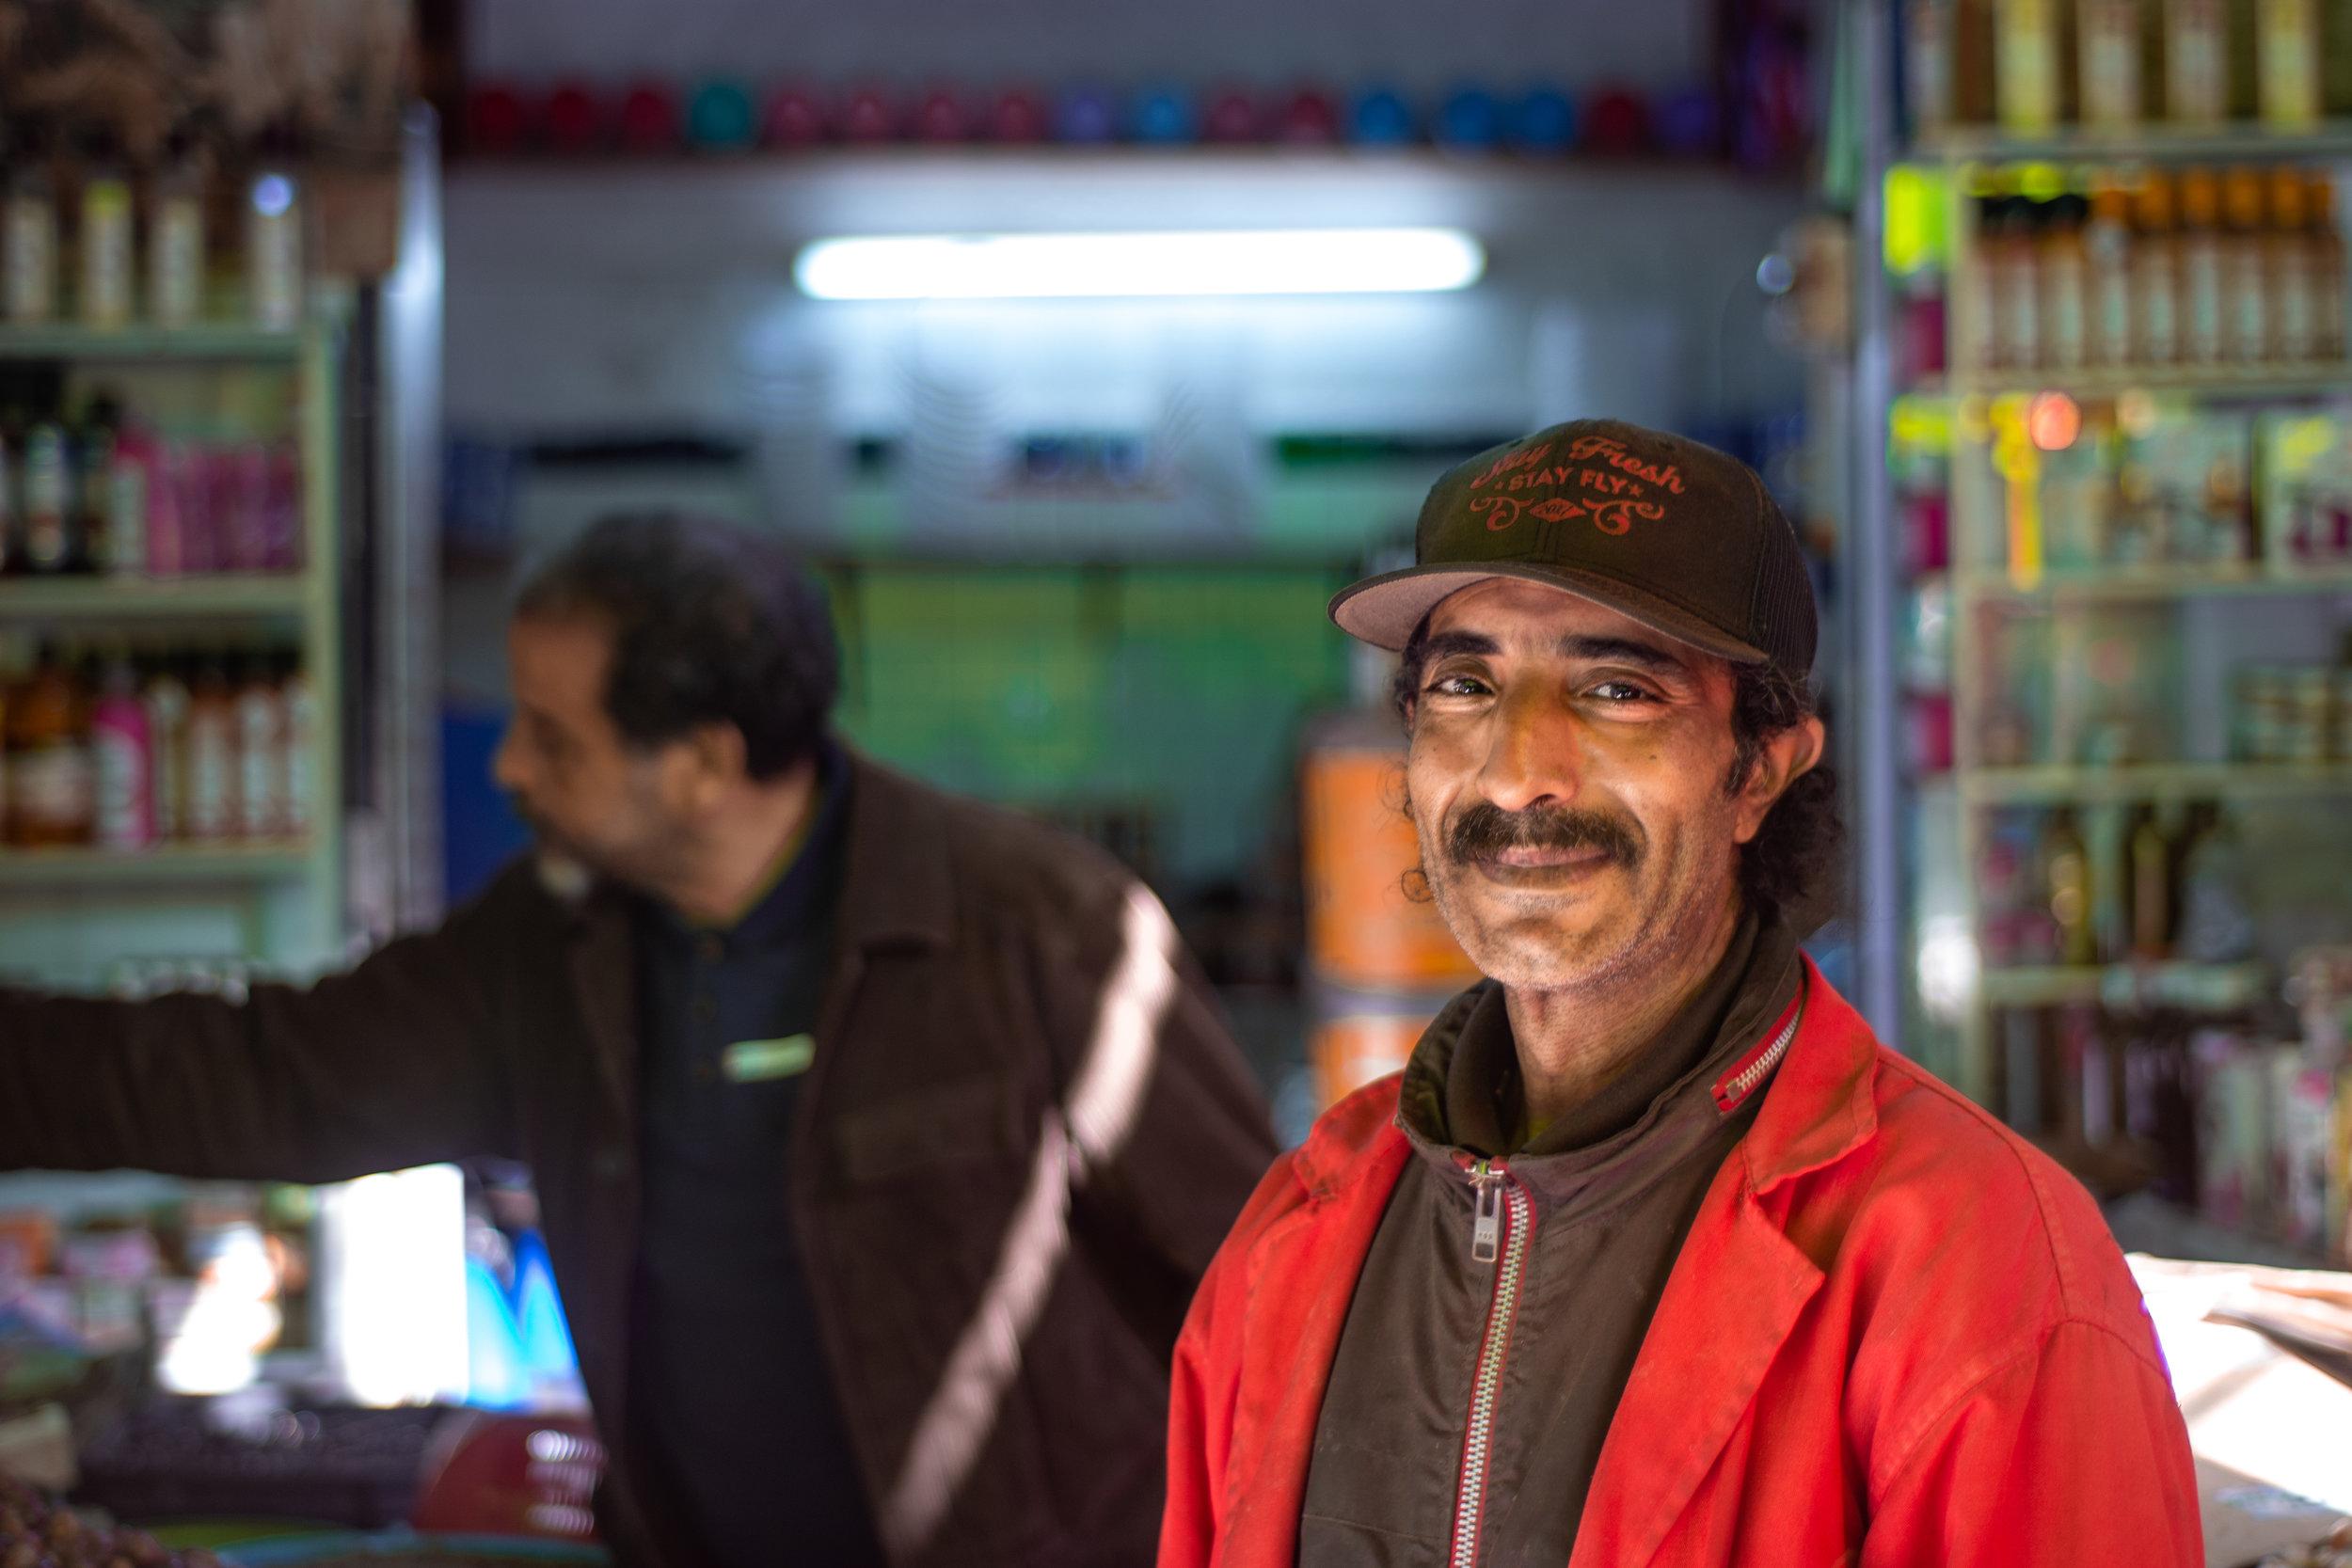 Abdullah, a vendor and native Casaoui